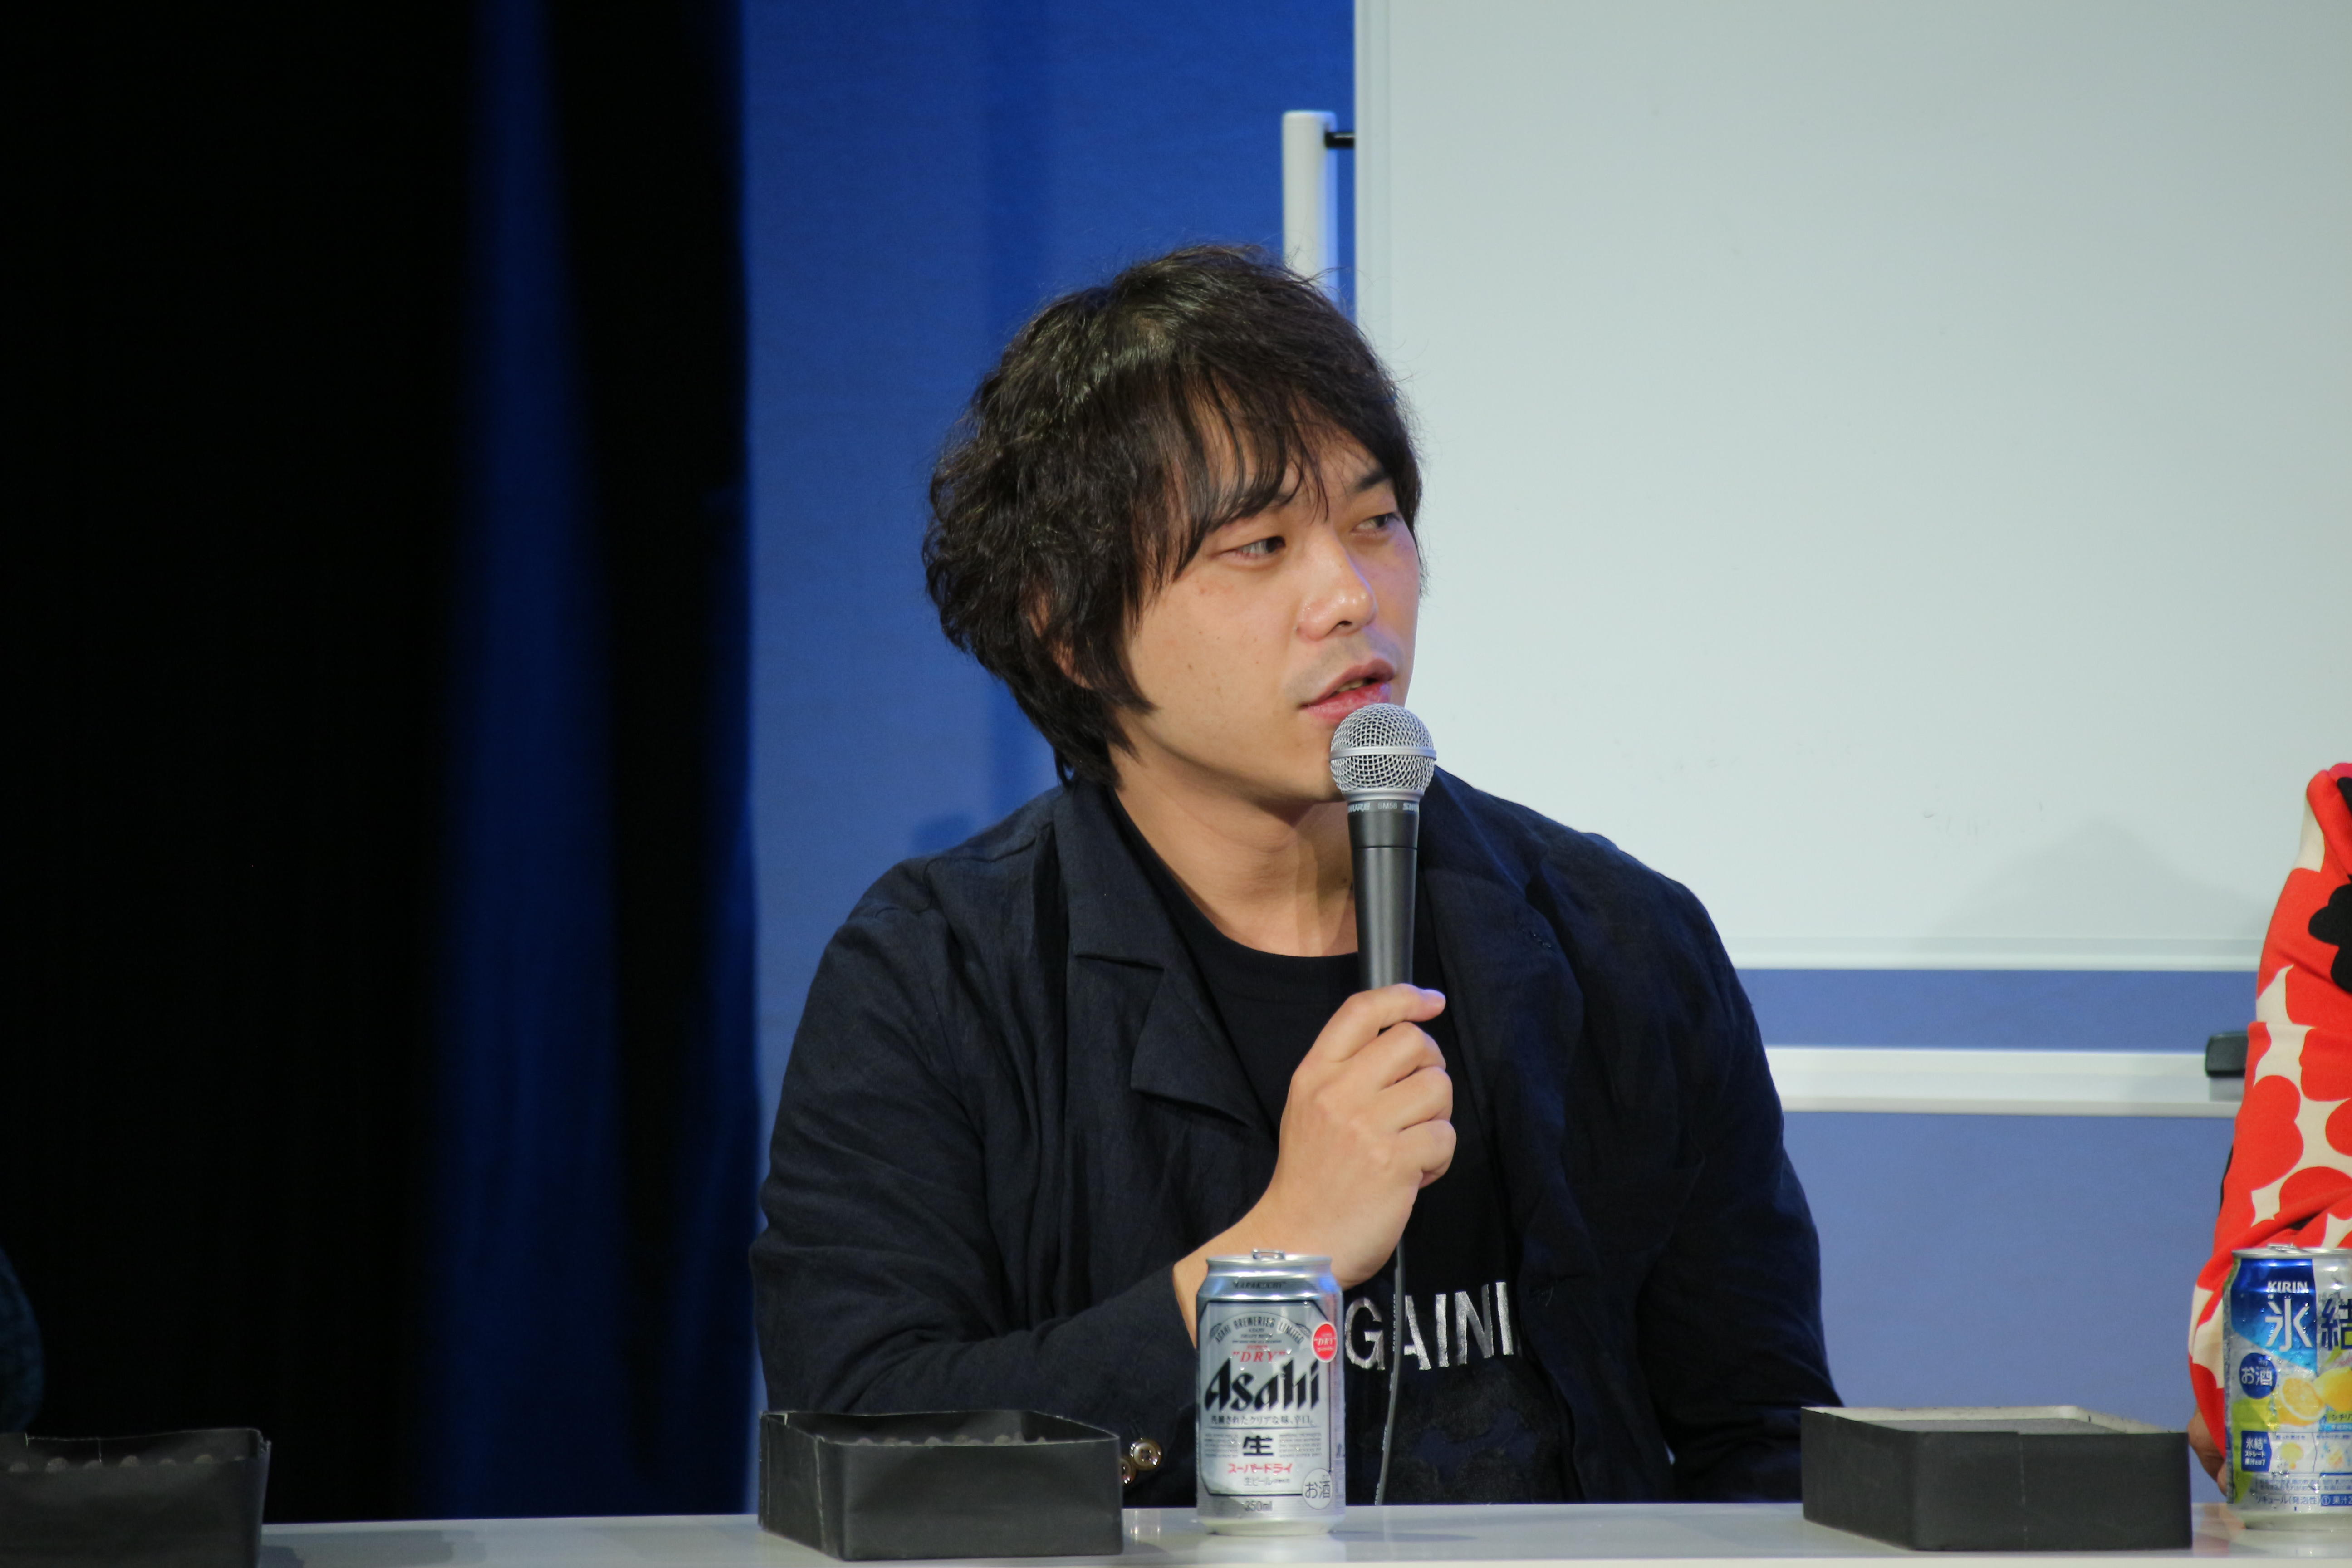 http://news.yoshimoto.co.jp/20180512231928-66cf1e0836dc5e40daf5367ea57213839ba97dd8.jpg